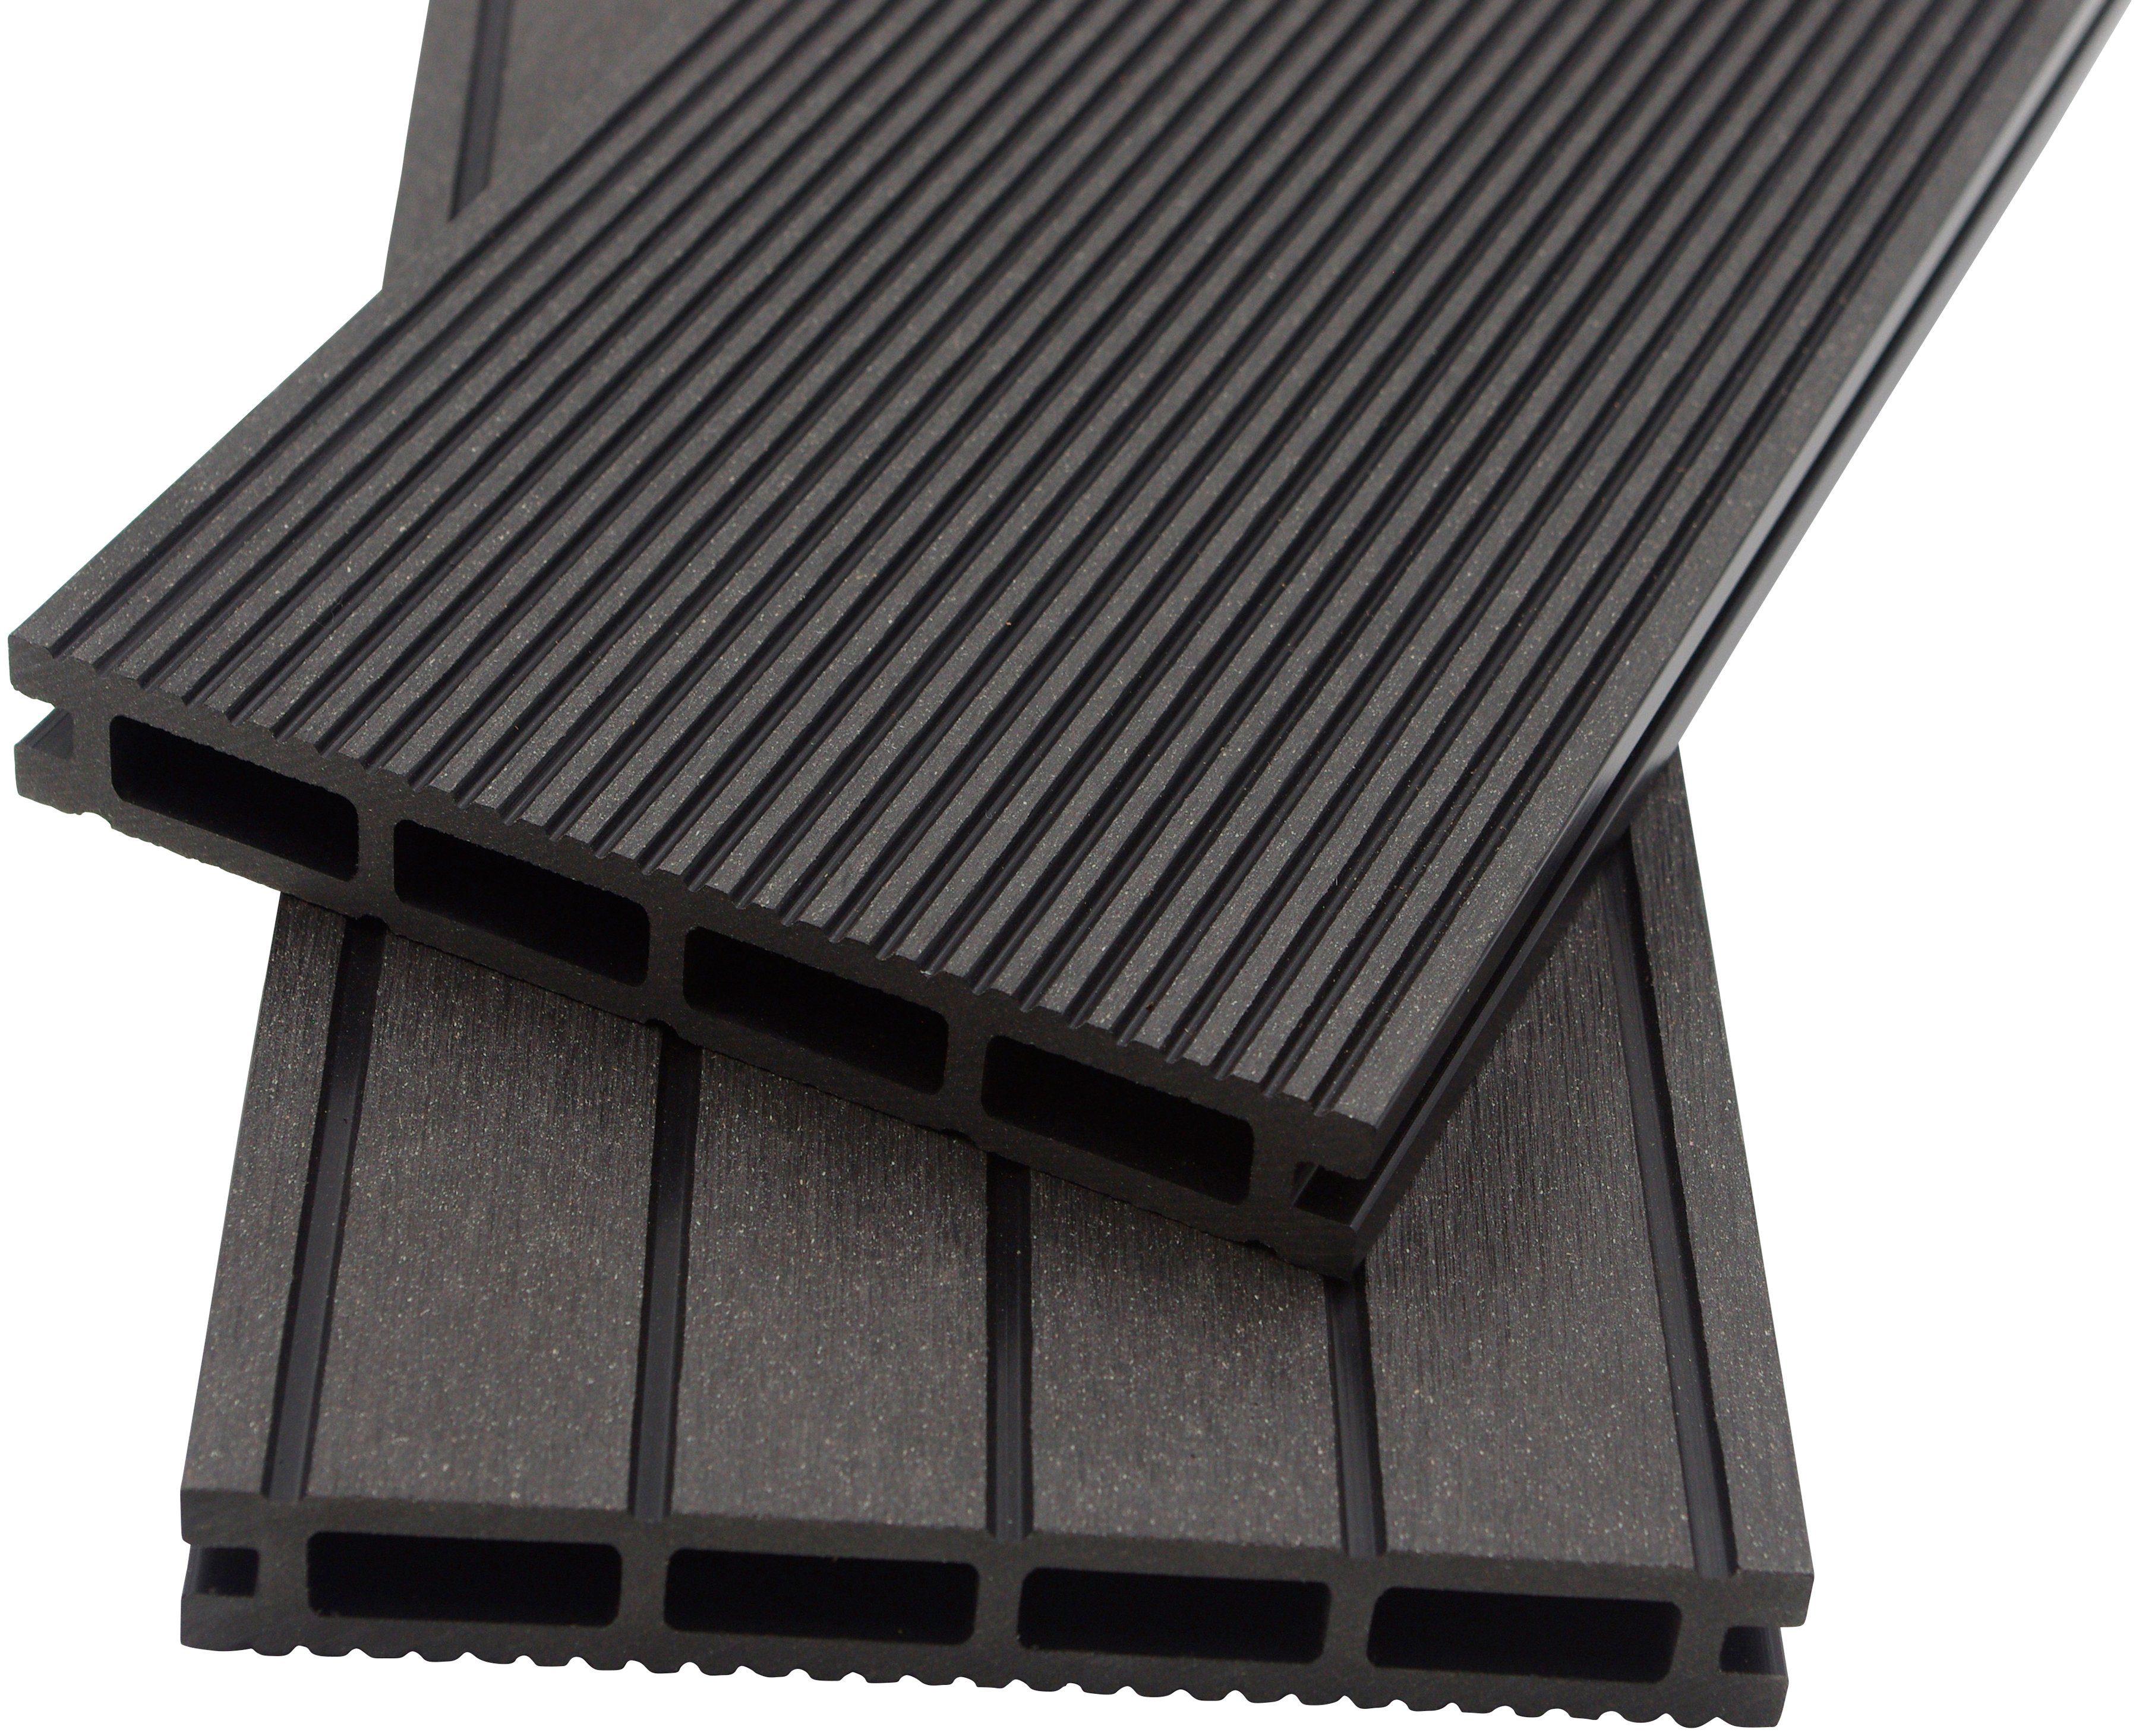 HOME DELUXE Komplett-Set: WPC-Terrassendielen , inkl. Unterkonstruktion, 4 m², anthrazit